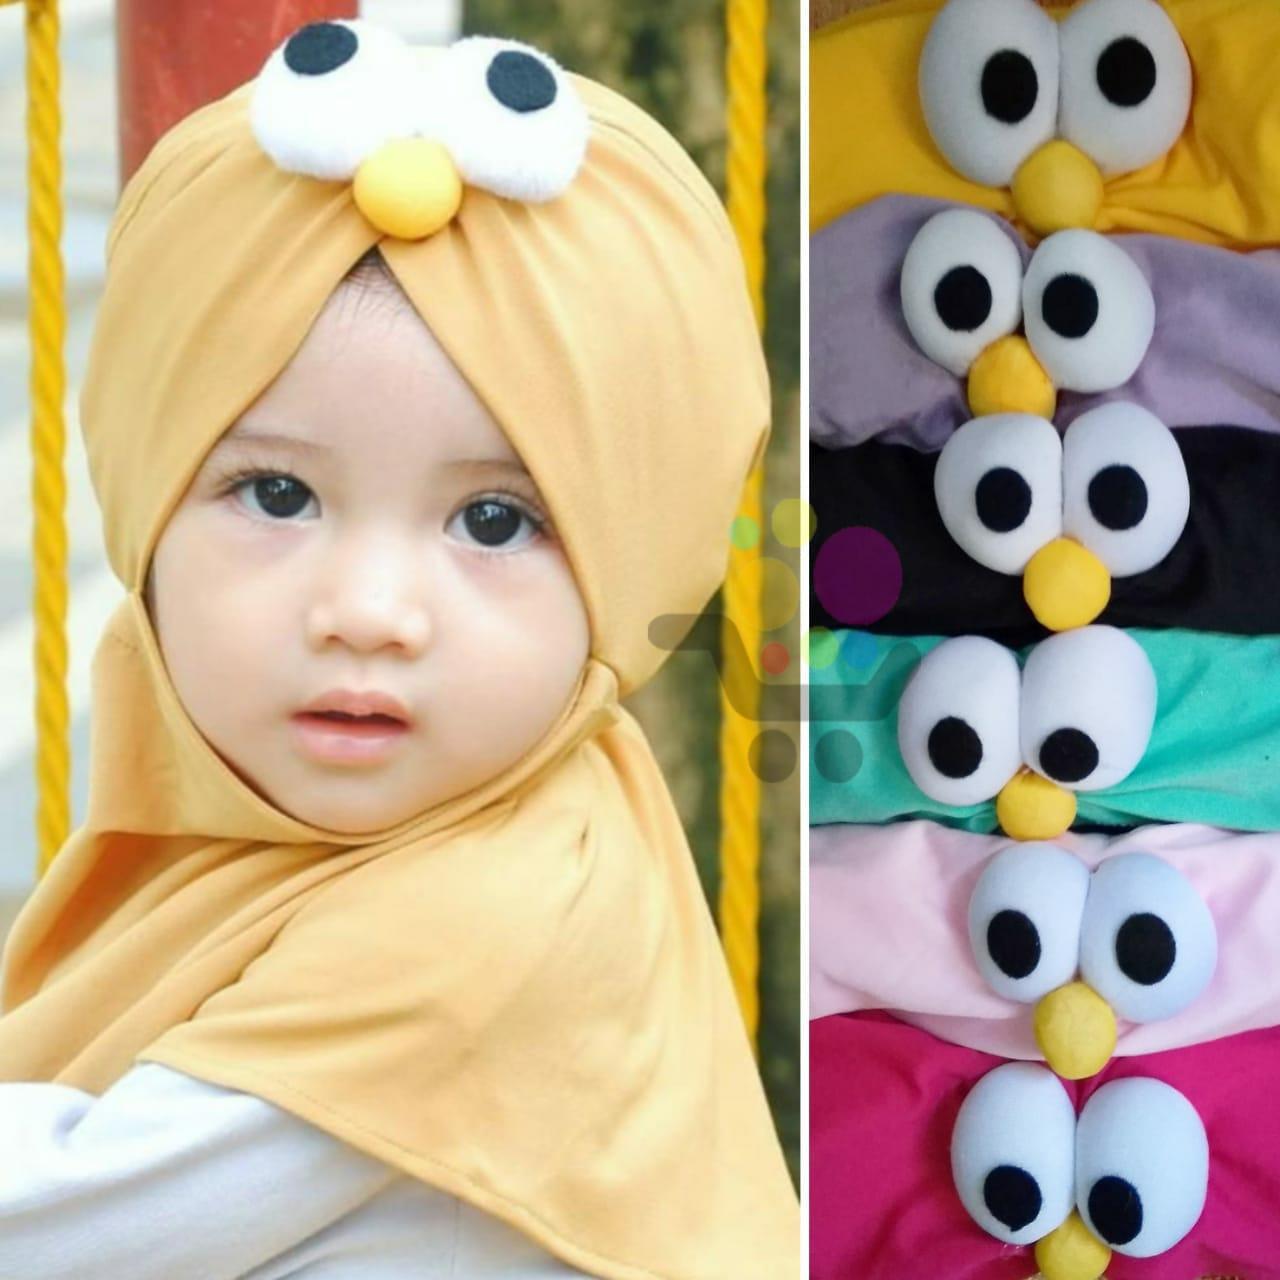 ... Kerudung Anak beli 3 kodi 11500 /pcs beda model / Jilbab Anak Bayi murah ...